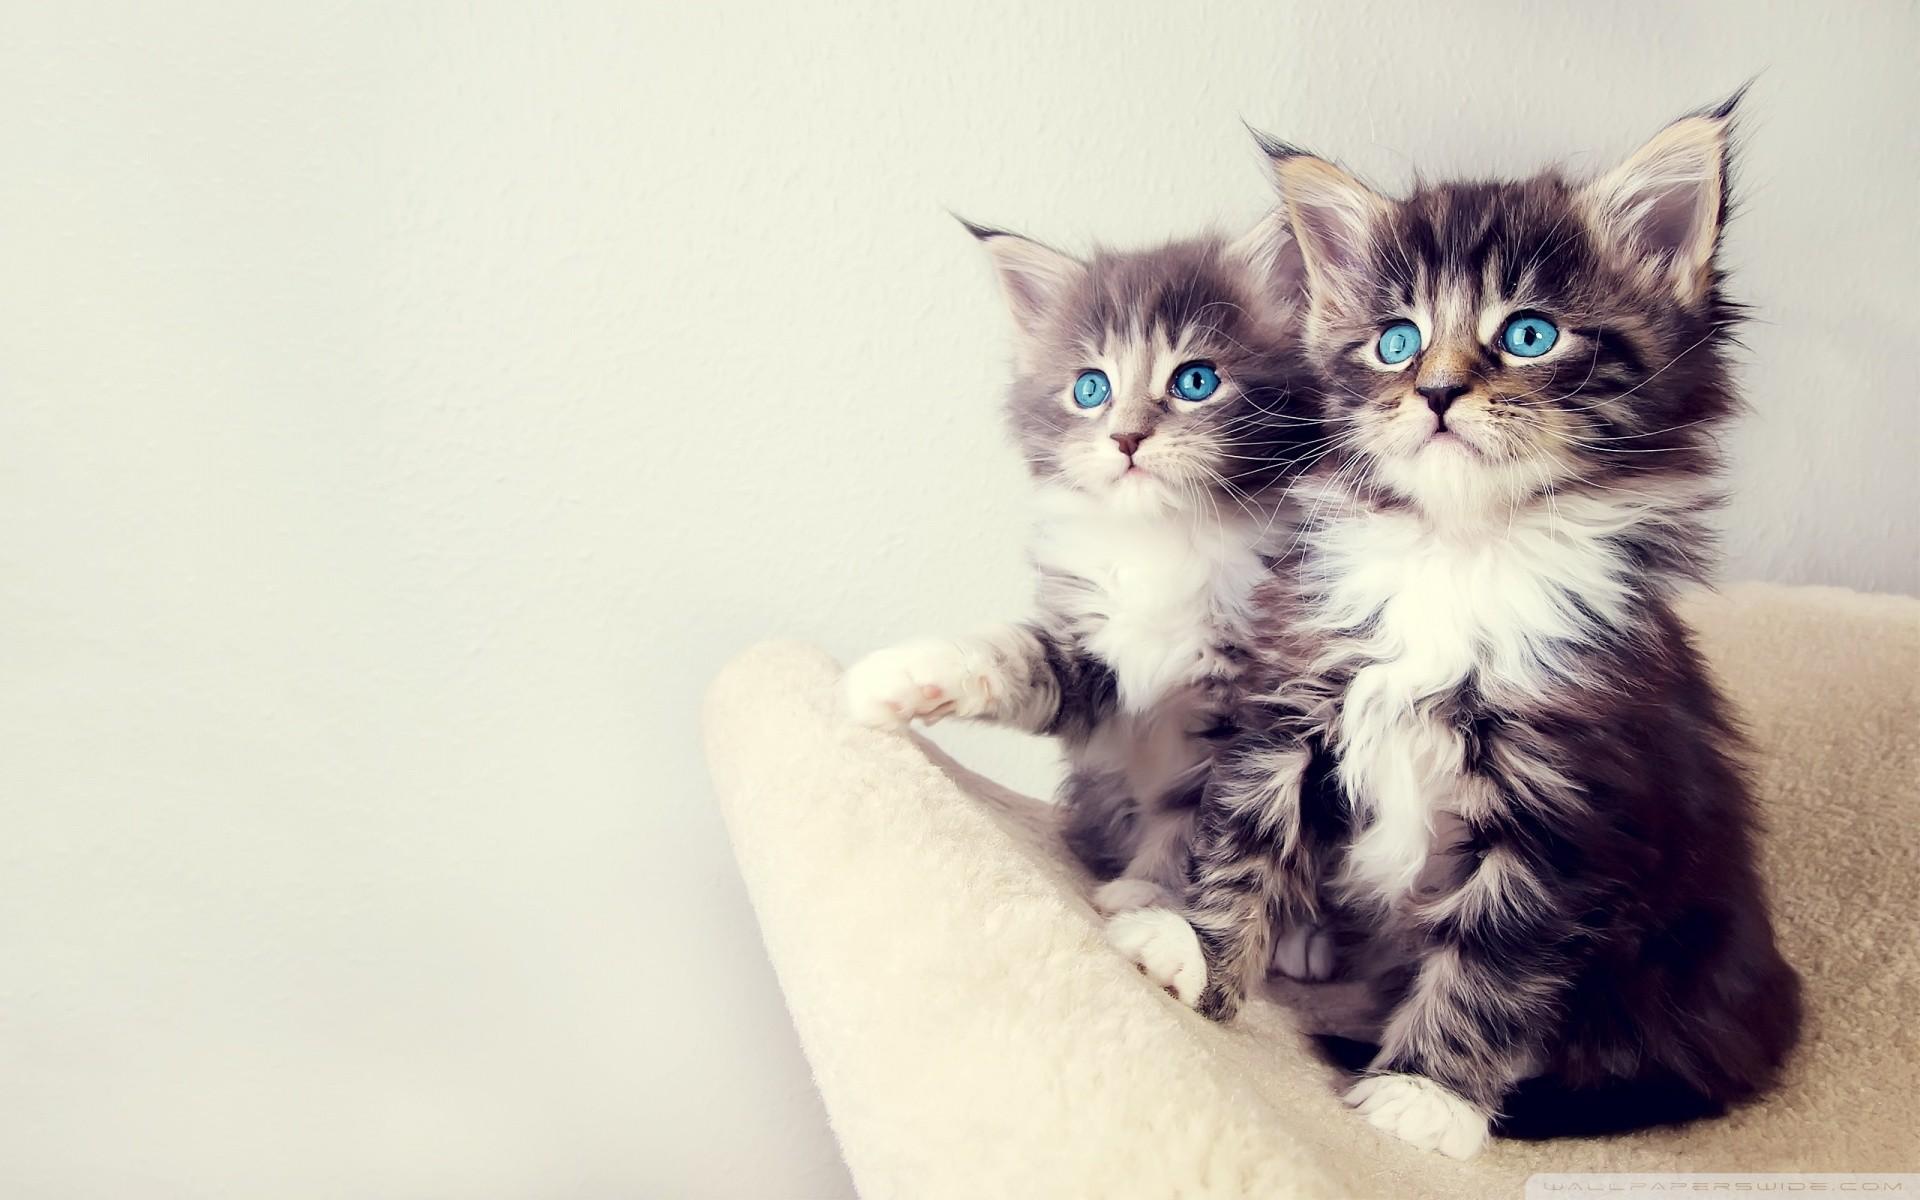 Baby Kittens Wallpaper 63 images